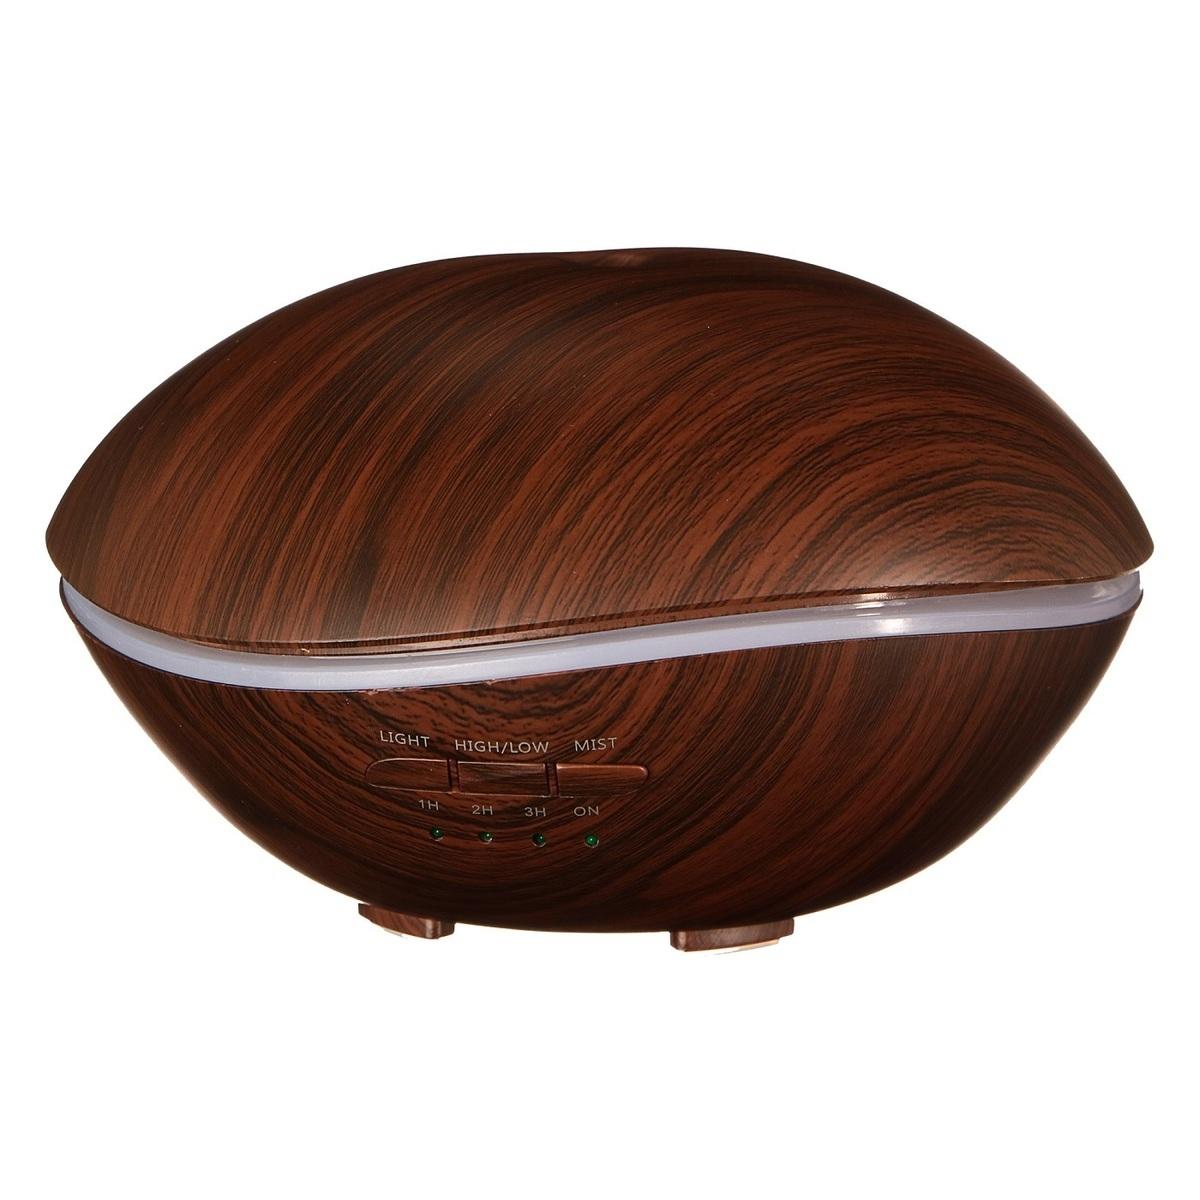 Aroma difuzér Stone, tmavé dřevo, 500 ml - SIXTOL